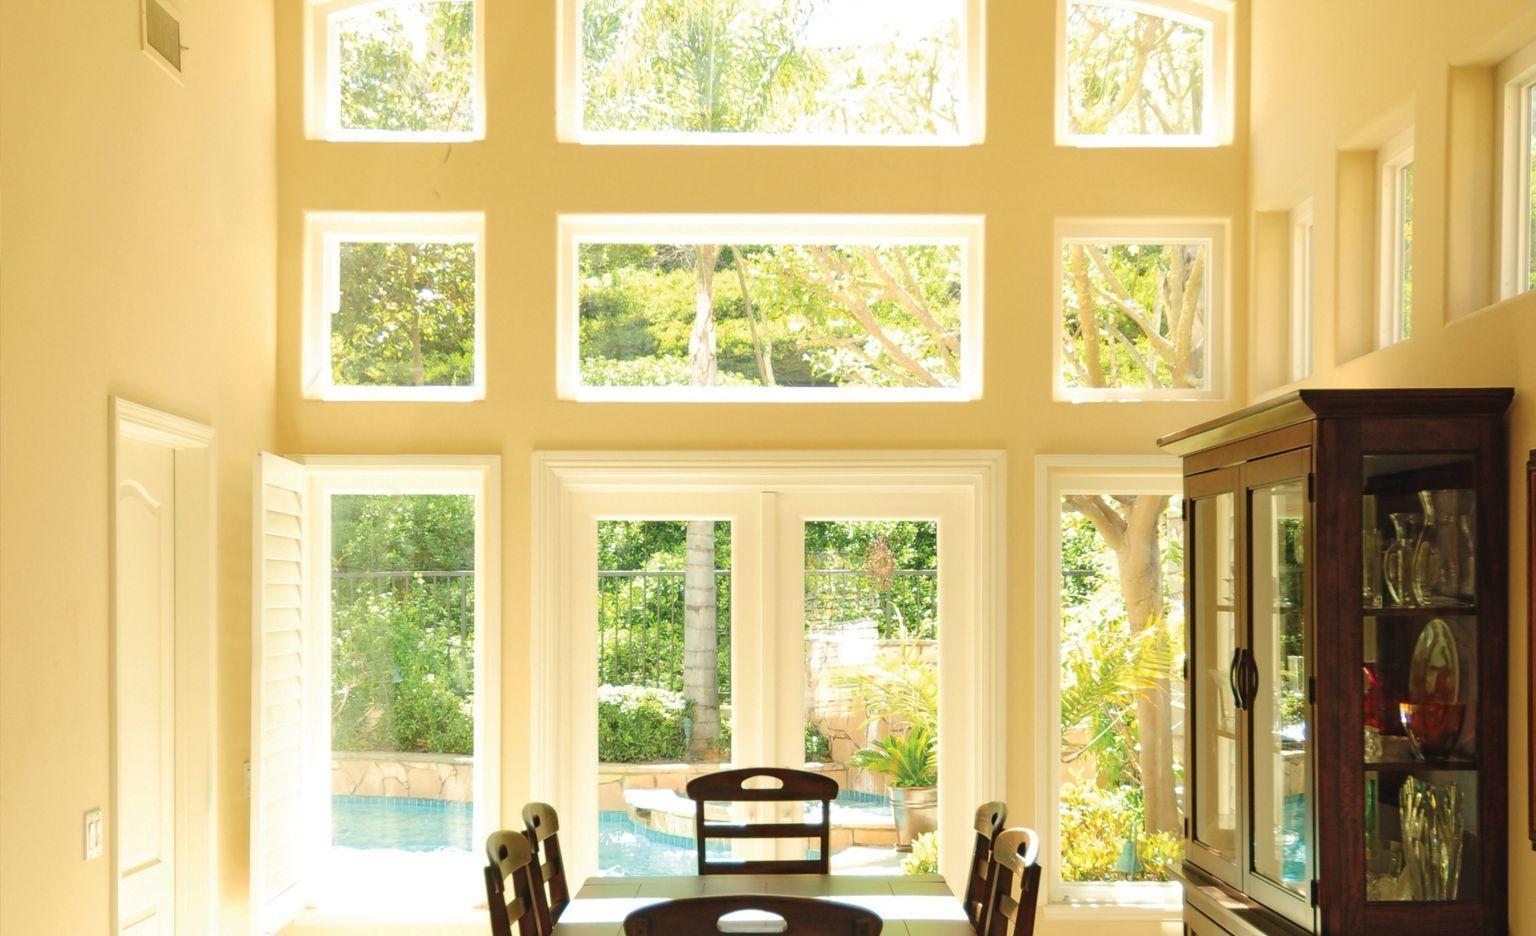 Simonton Windows And Patio Doors Windows And Patio Doors Patio